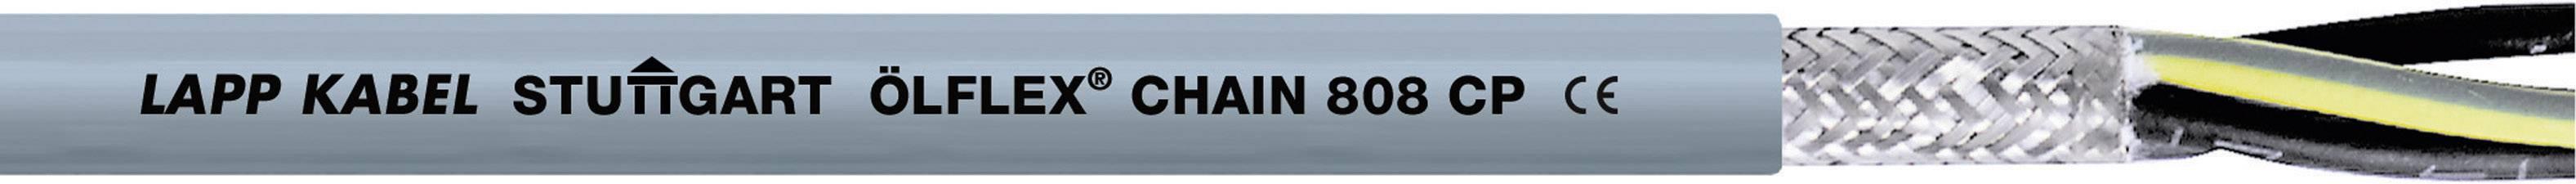 Žíla kabelu LappKabel ÖLFLEX CHAIN 808 CP 7G0,5 (1027755), 7x 0,5 mm², polyurethan, Ø 8,5 mm, stíněný, 100 m,